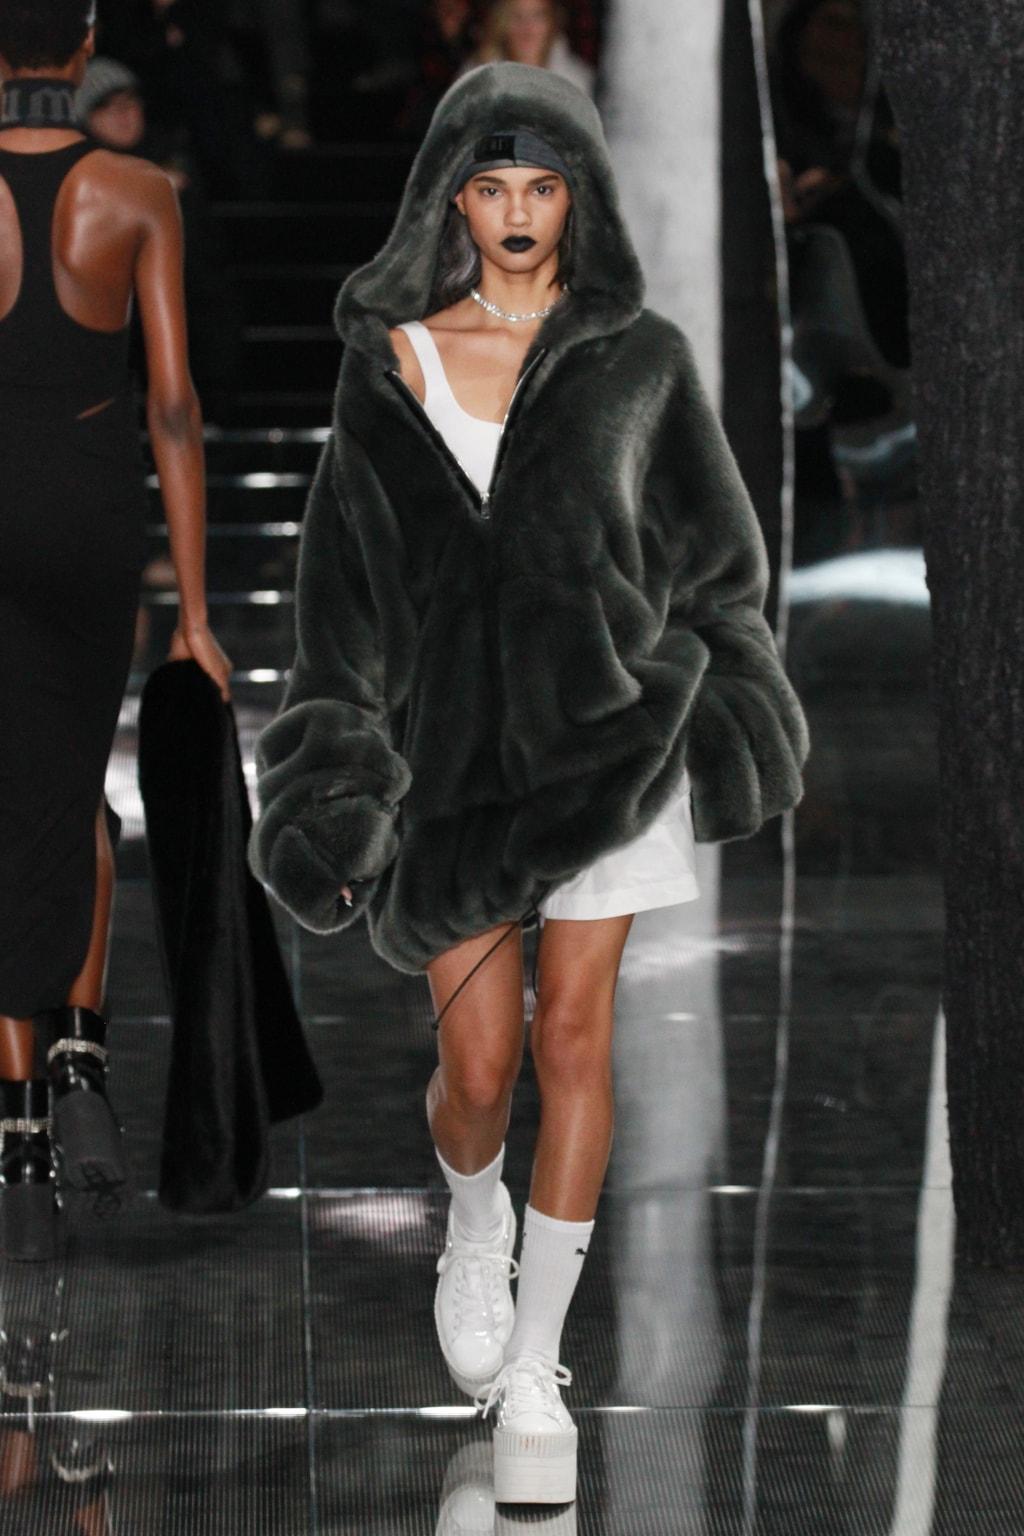 Model on runway wearing fur coat